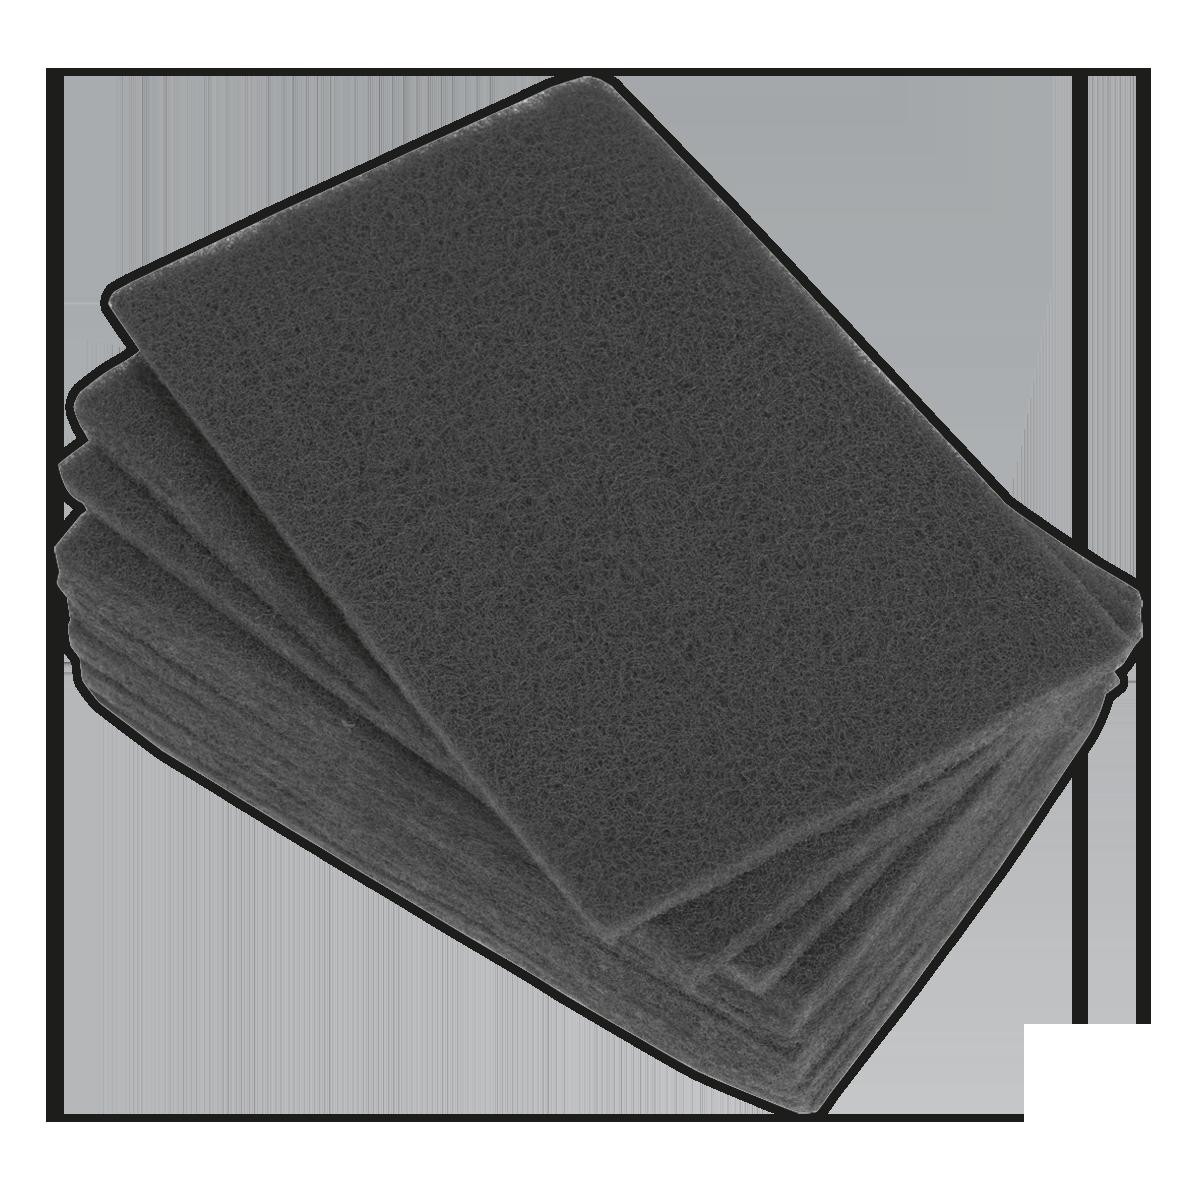 Abrasive Finishing Pad 150 x 230mm Ultra-Fine Pack of 10